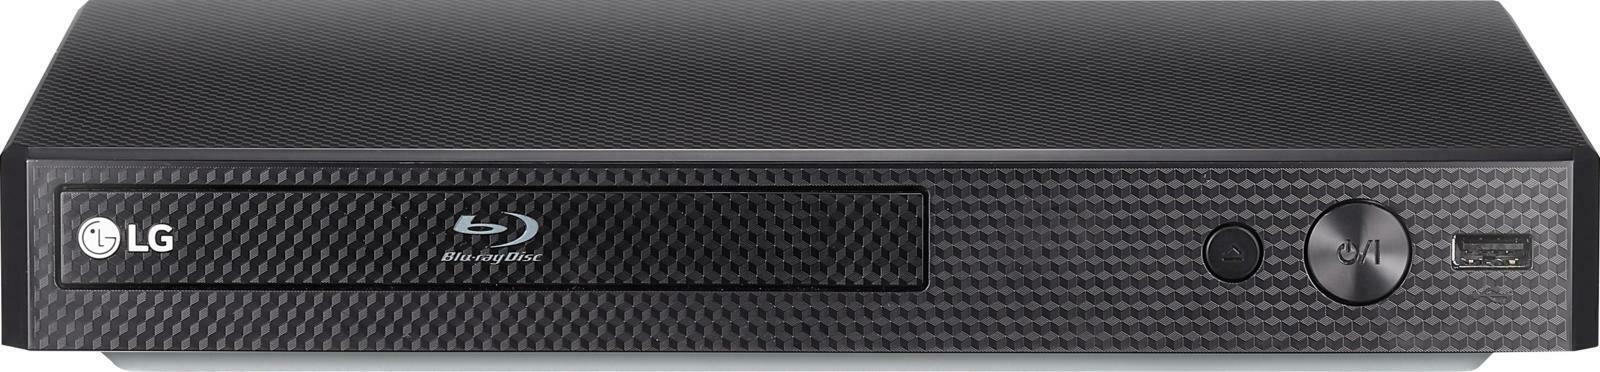 LG - Streaming Audio Blu-ray Player - Black - new (bb) - $80.18